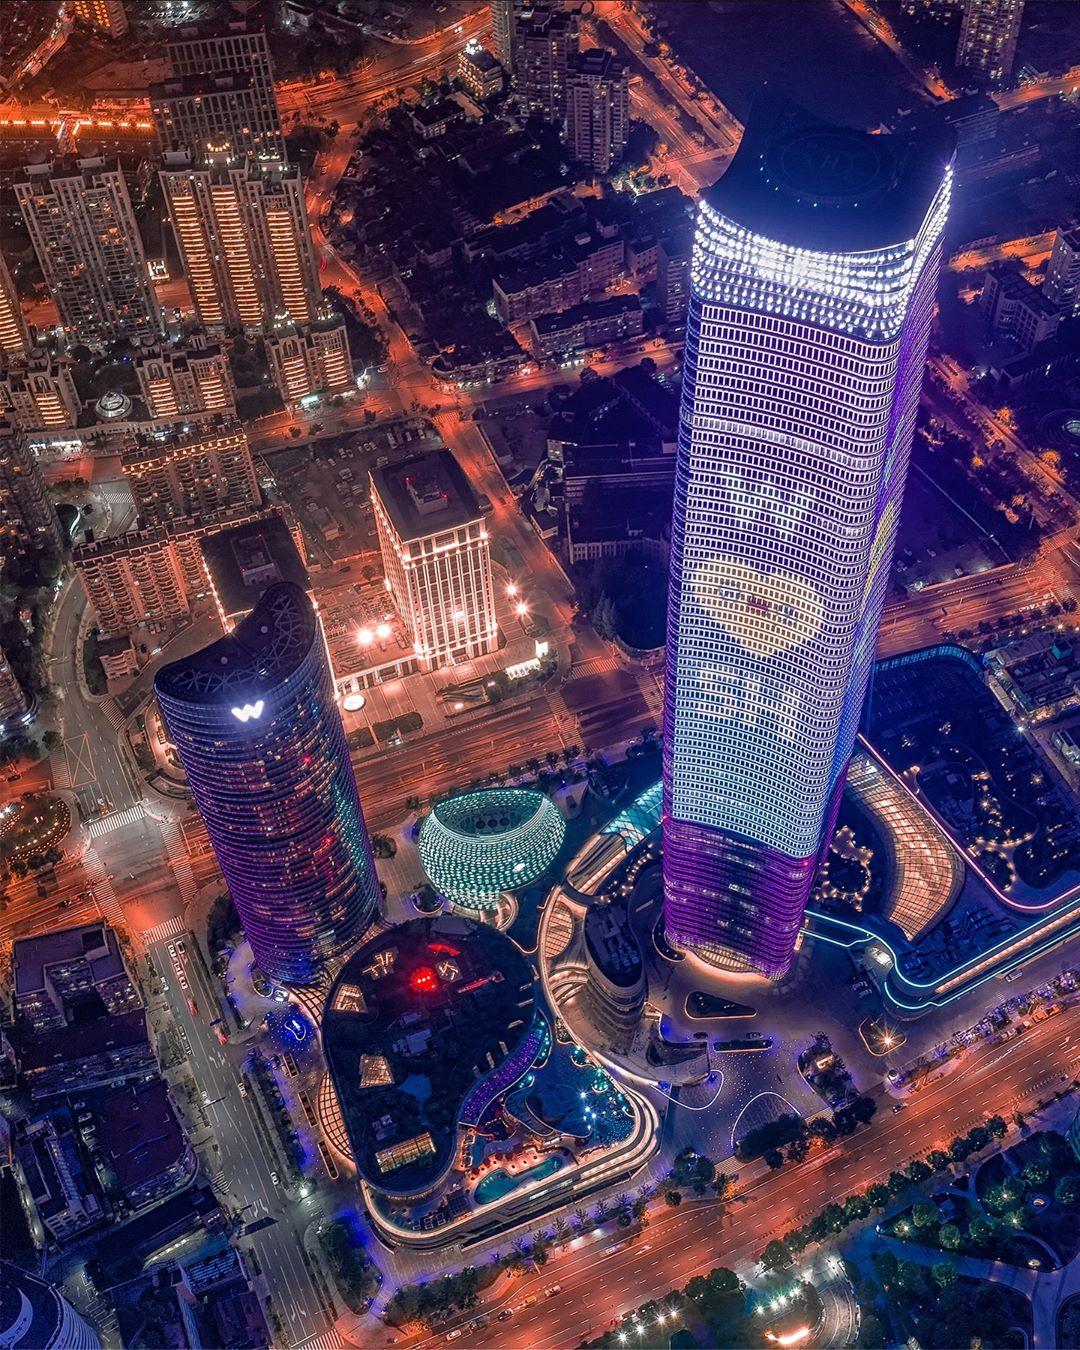 Shanghai 上海 Photo by Aaron Shao